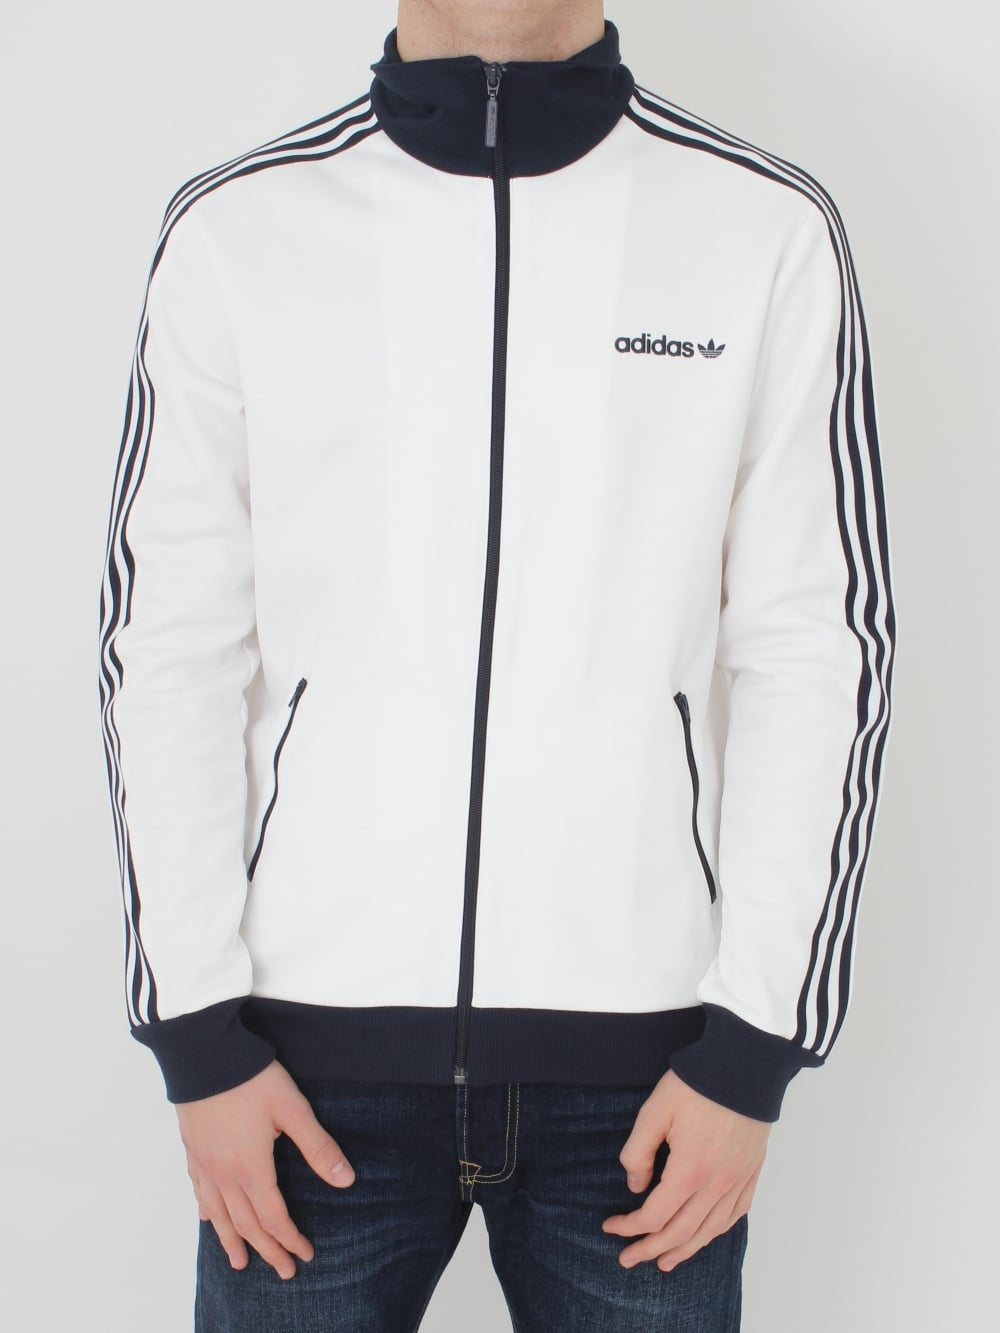 adidas originals white track top